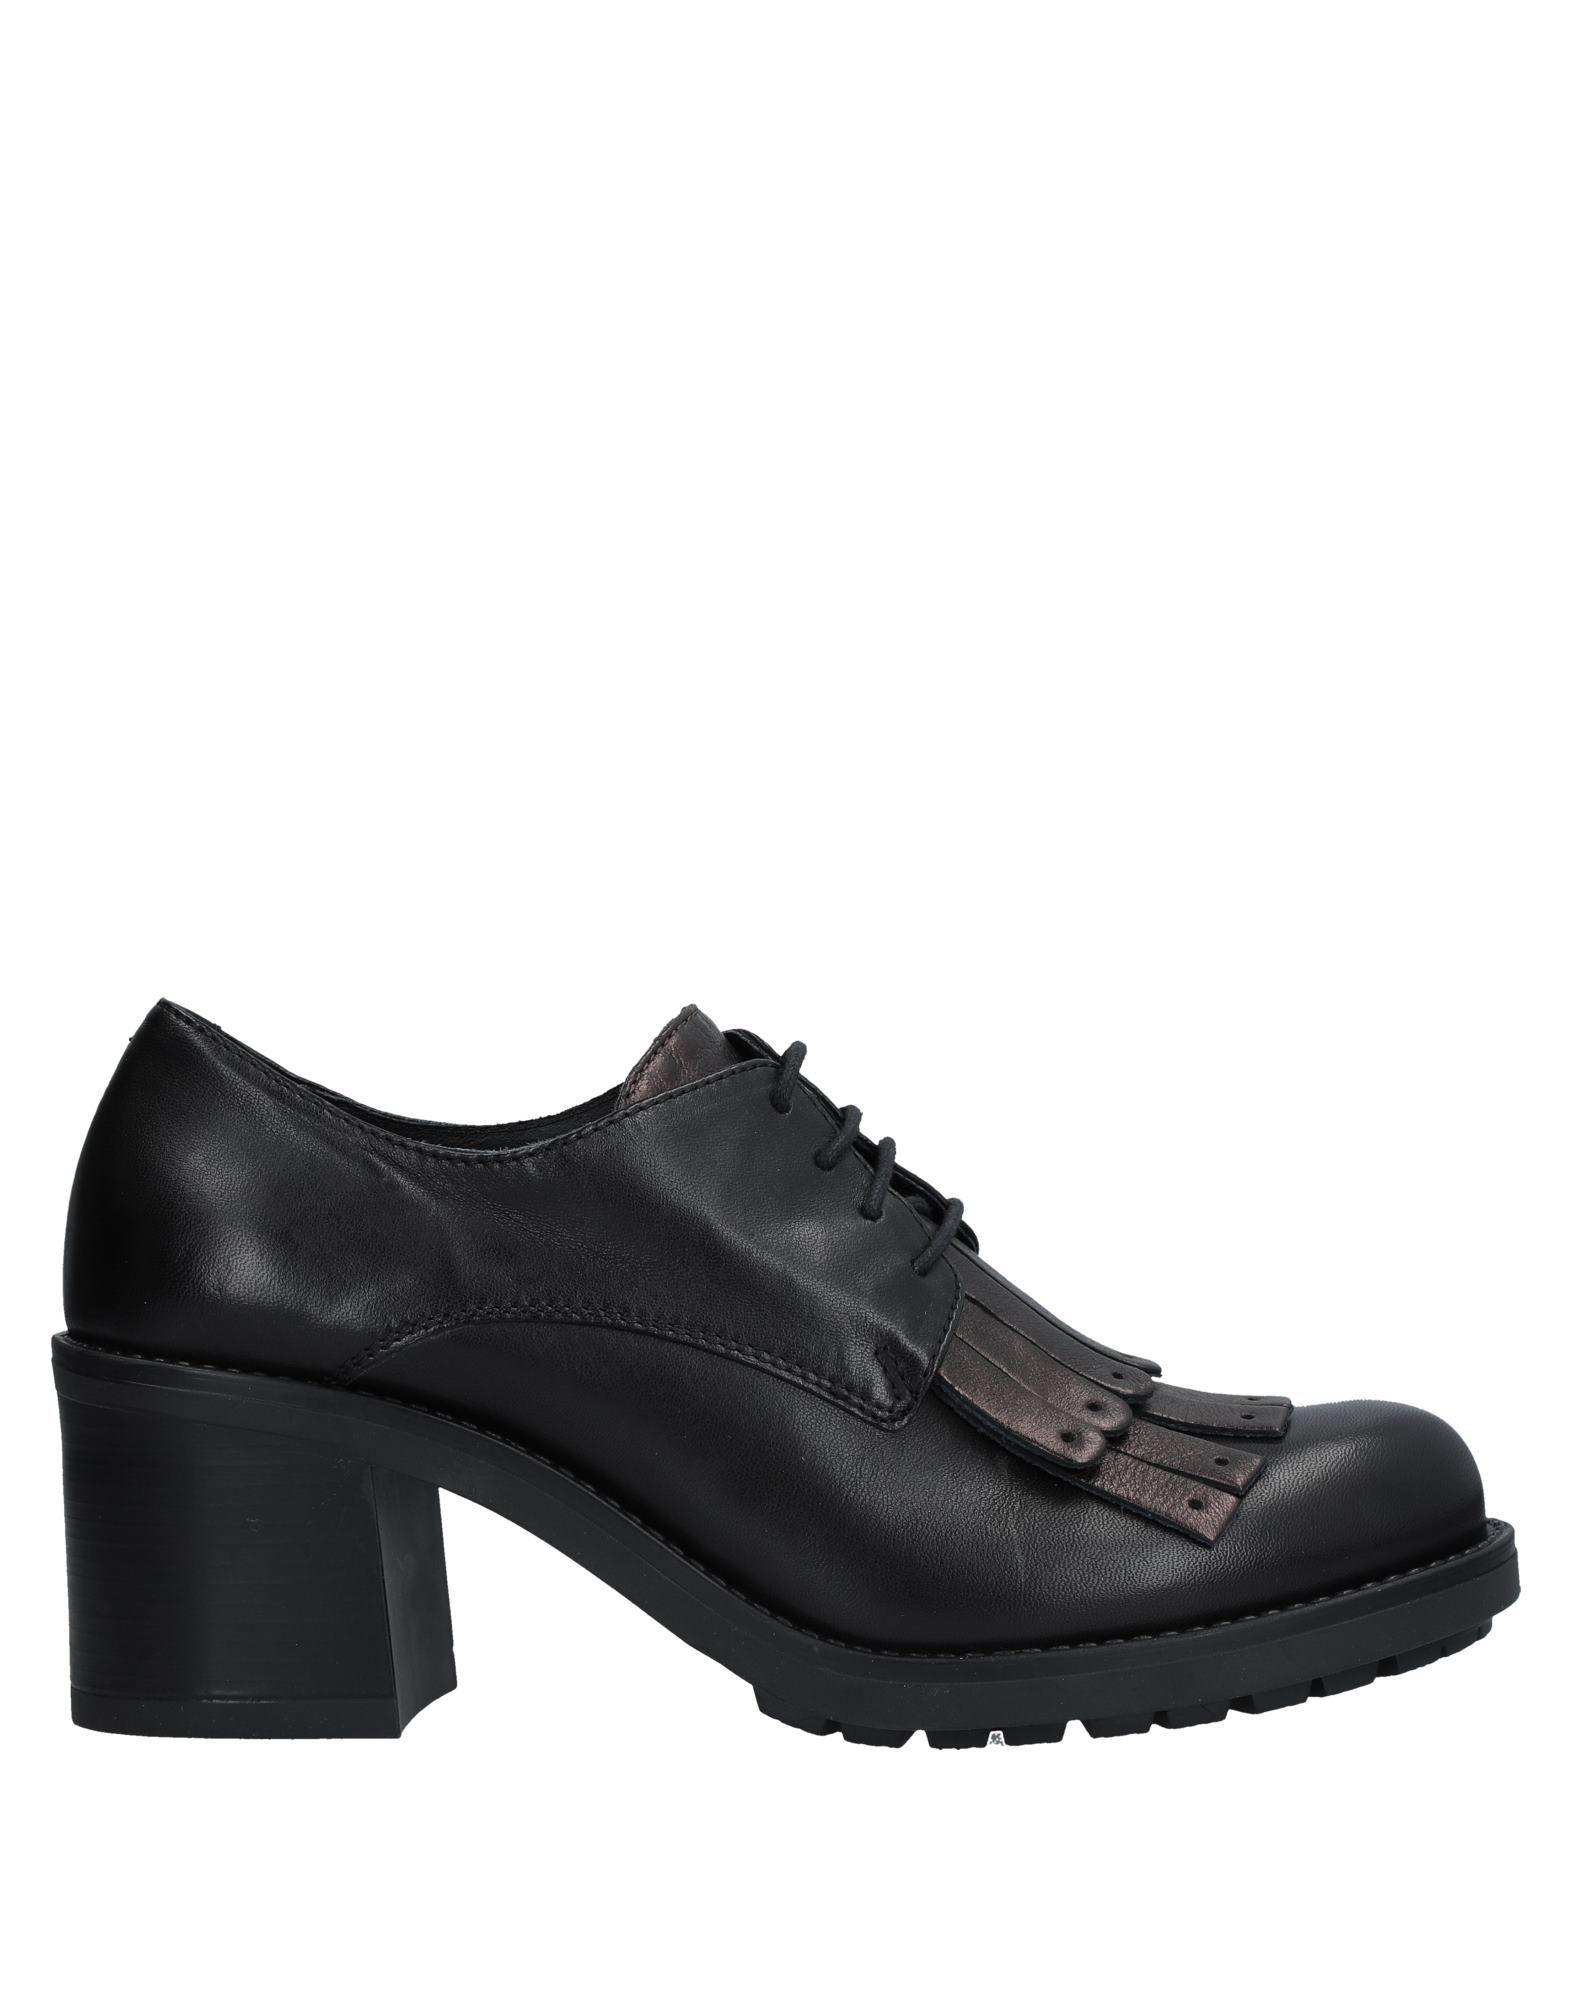 Stringate Tosca Blu Donna Shoes Donna Blu - 11533651WP 421213